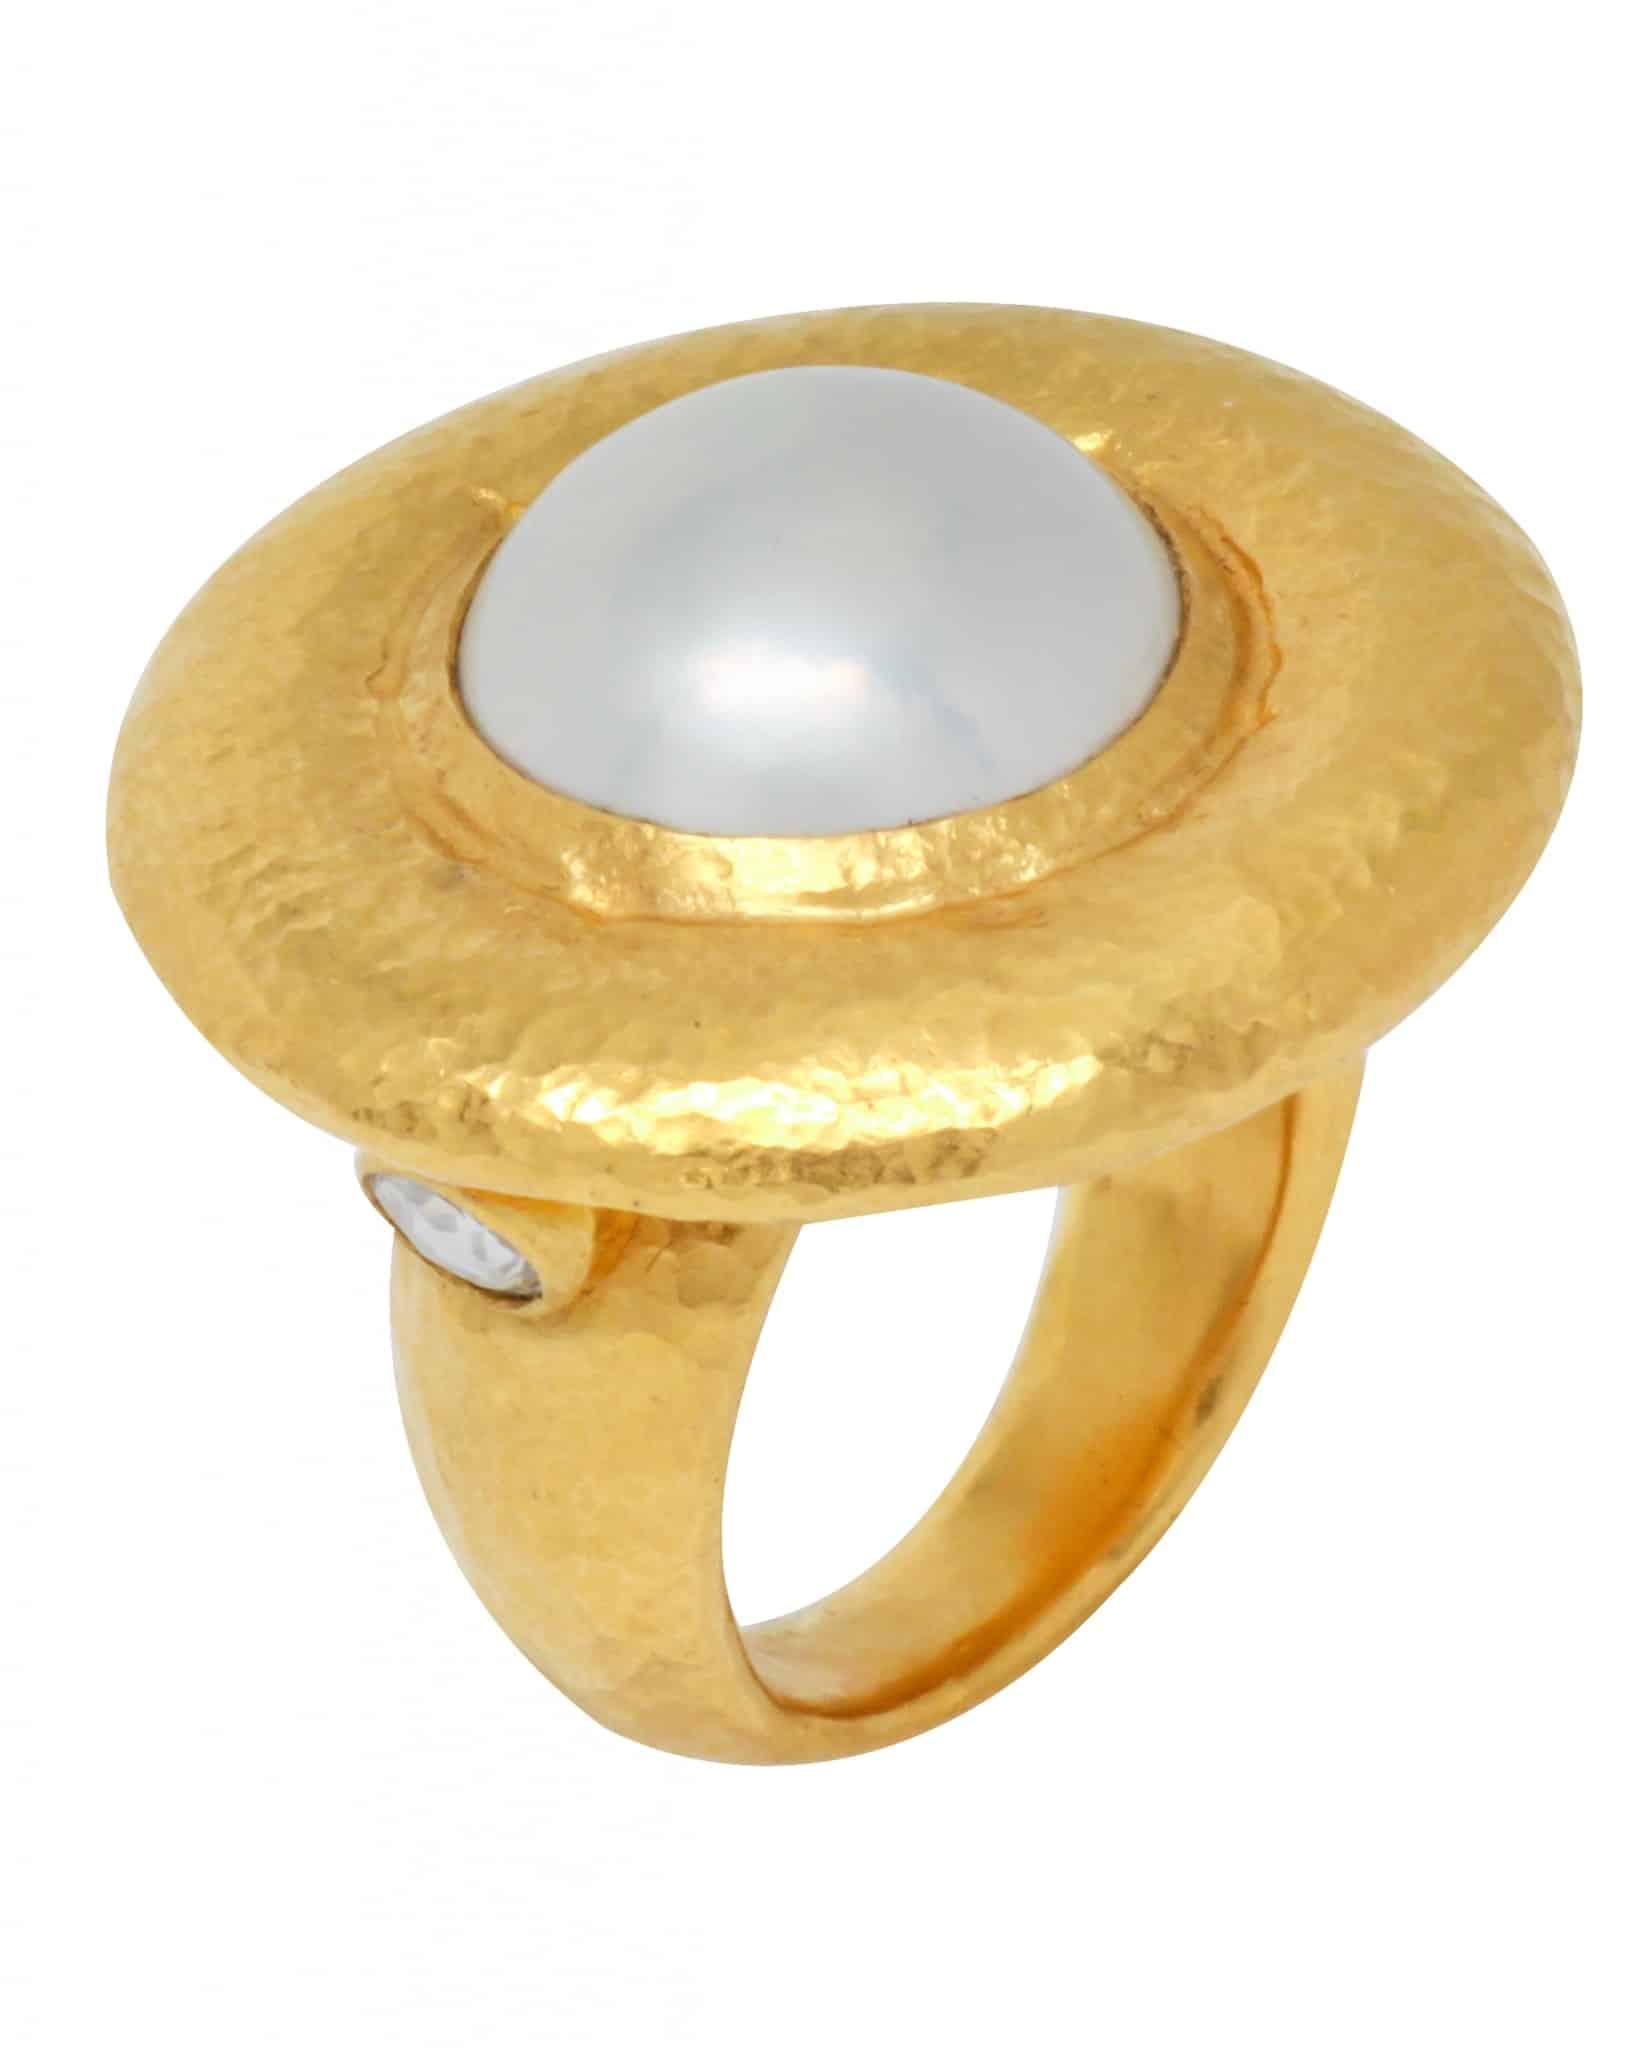 GURHAN – Gold Ring white mabe pearl, sz 6.25 RLGWFWMPR152DIRC